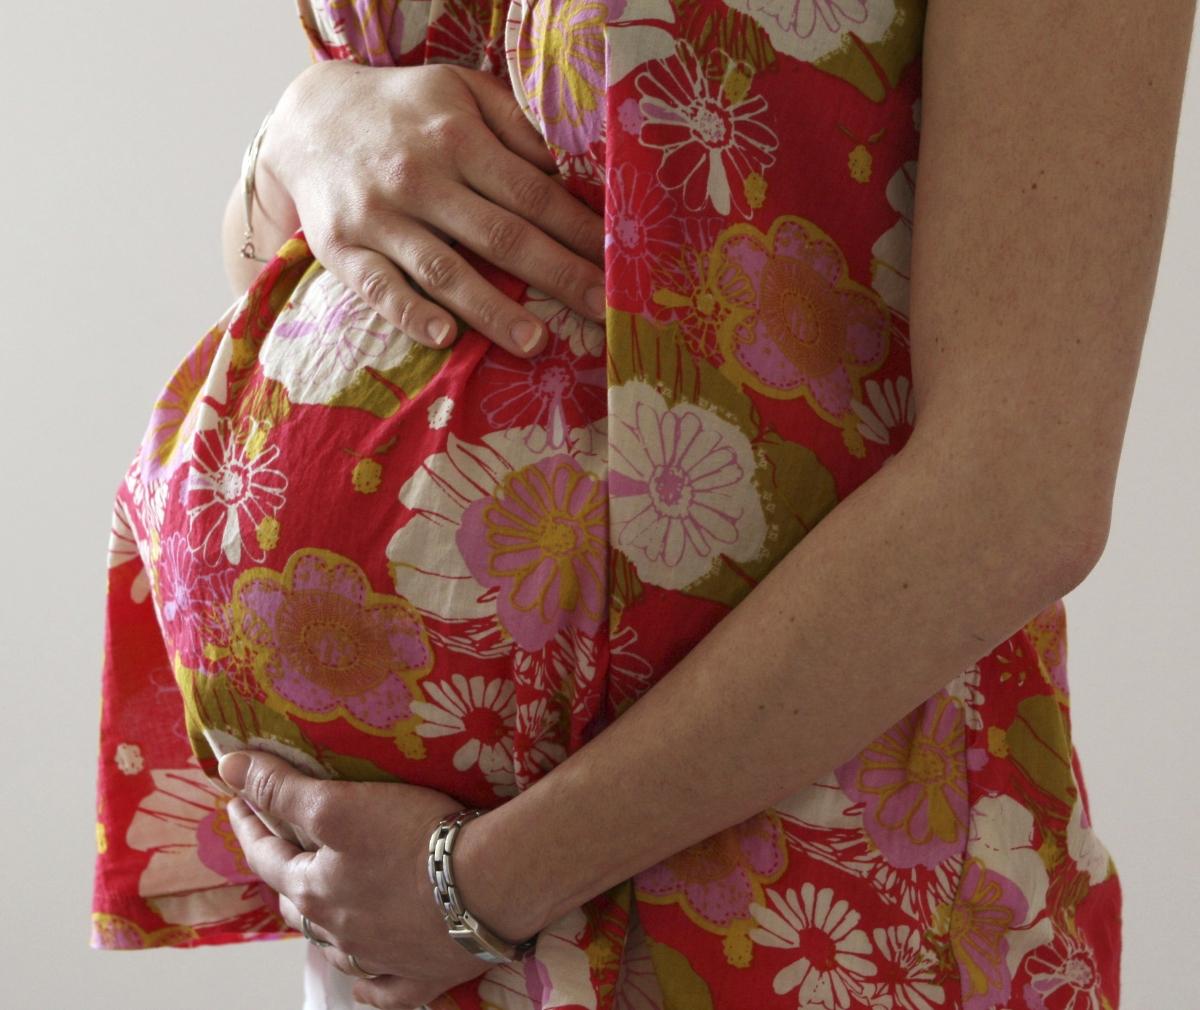 Teen pregnancy in England